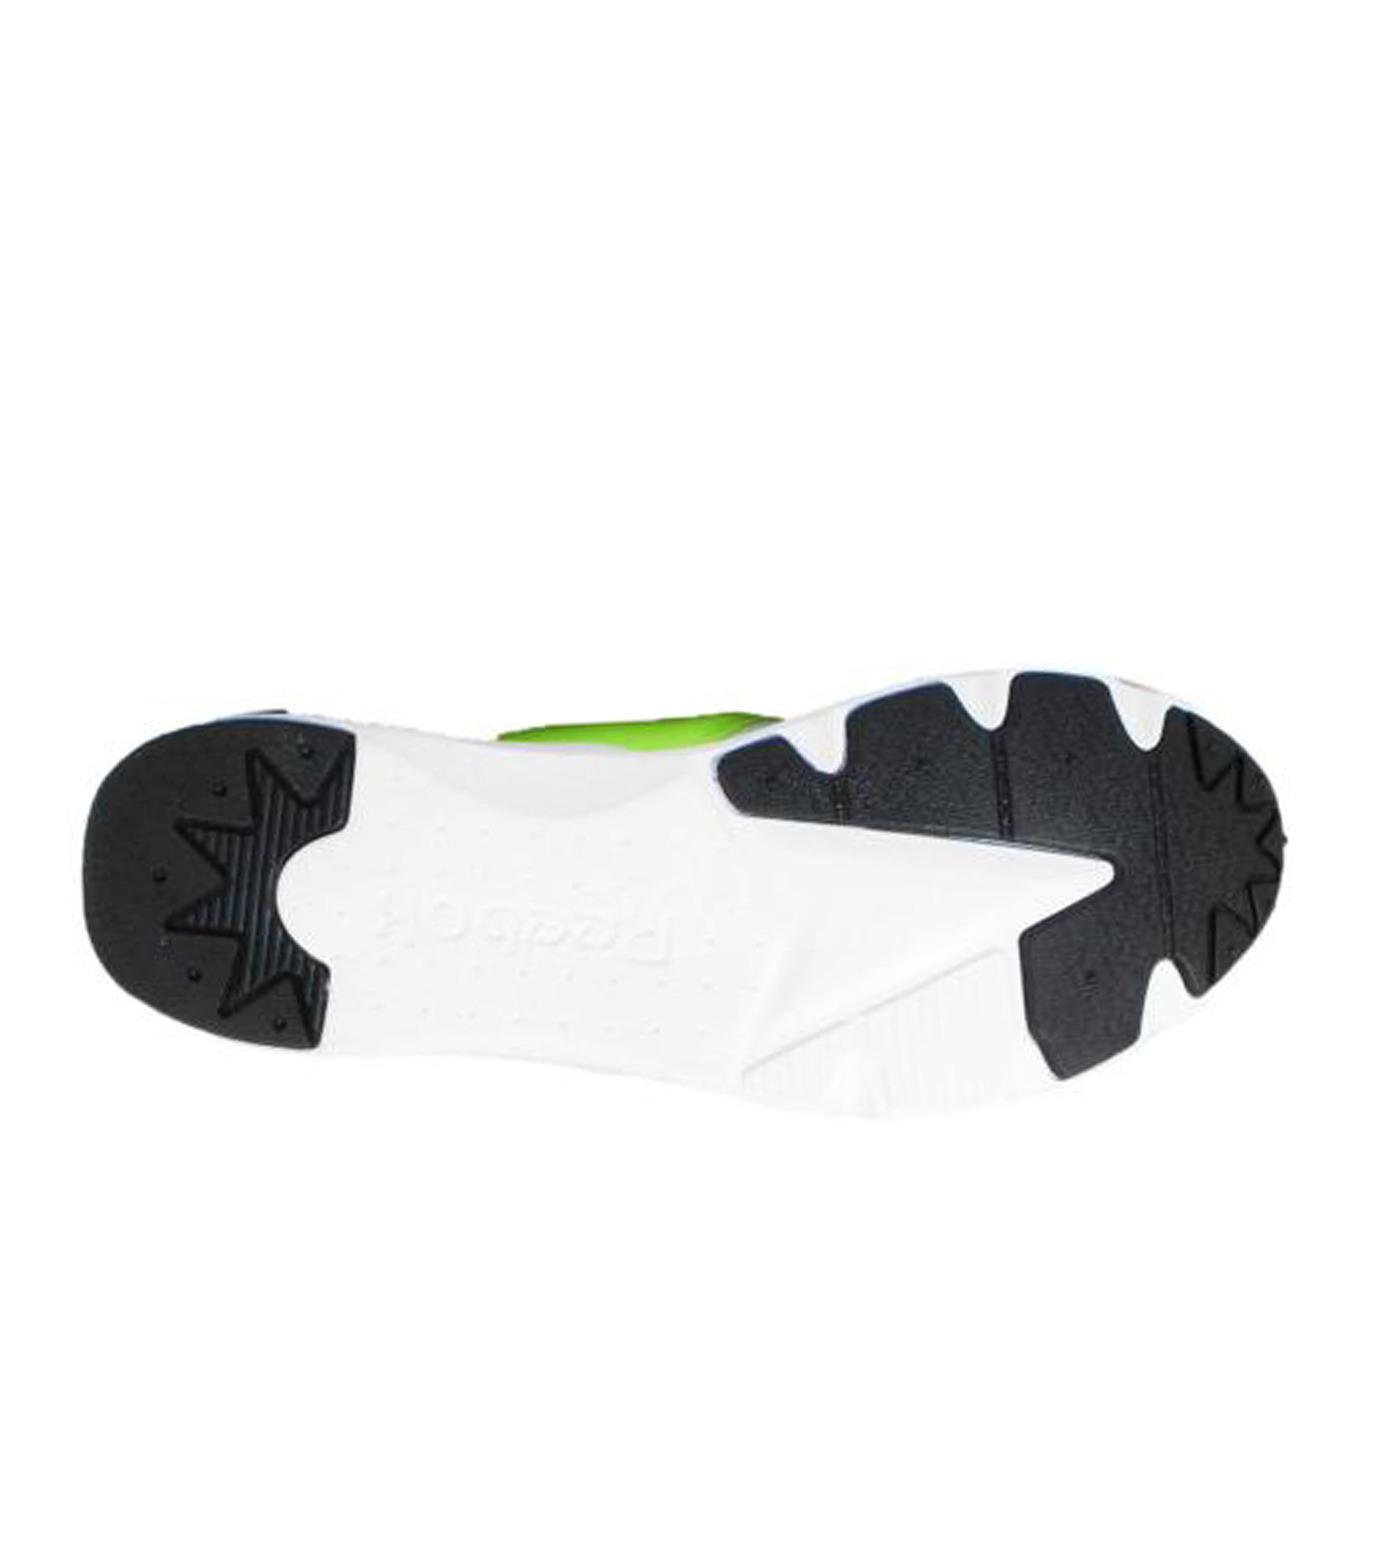 Reebok(リーボック)のFURYLITE-YELLOW(シューズ/shoes)-V69441-32 拡大詳細画像2